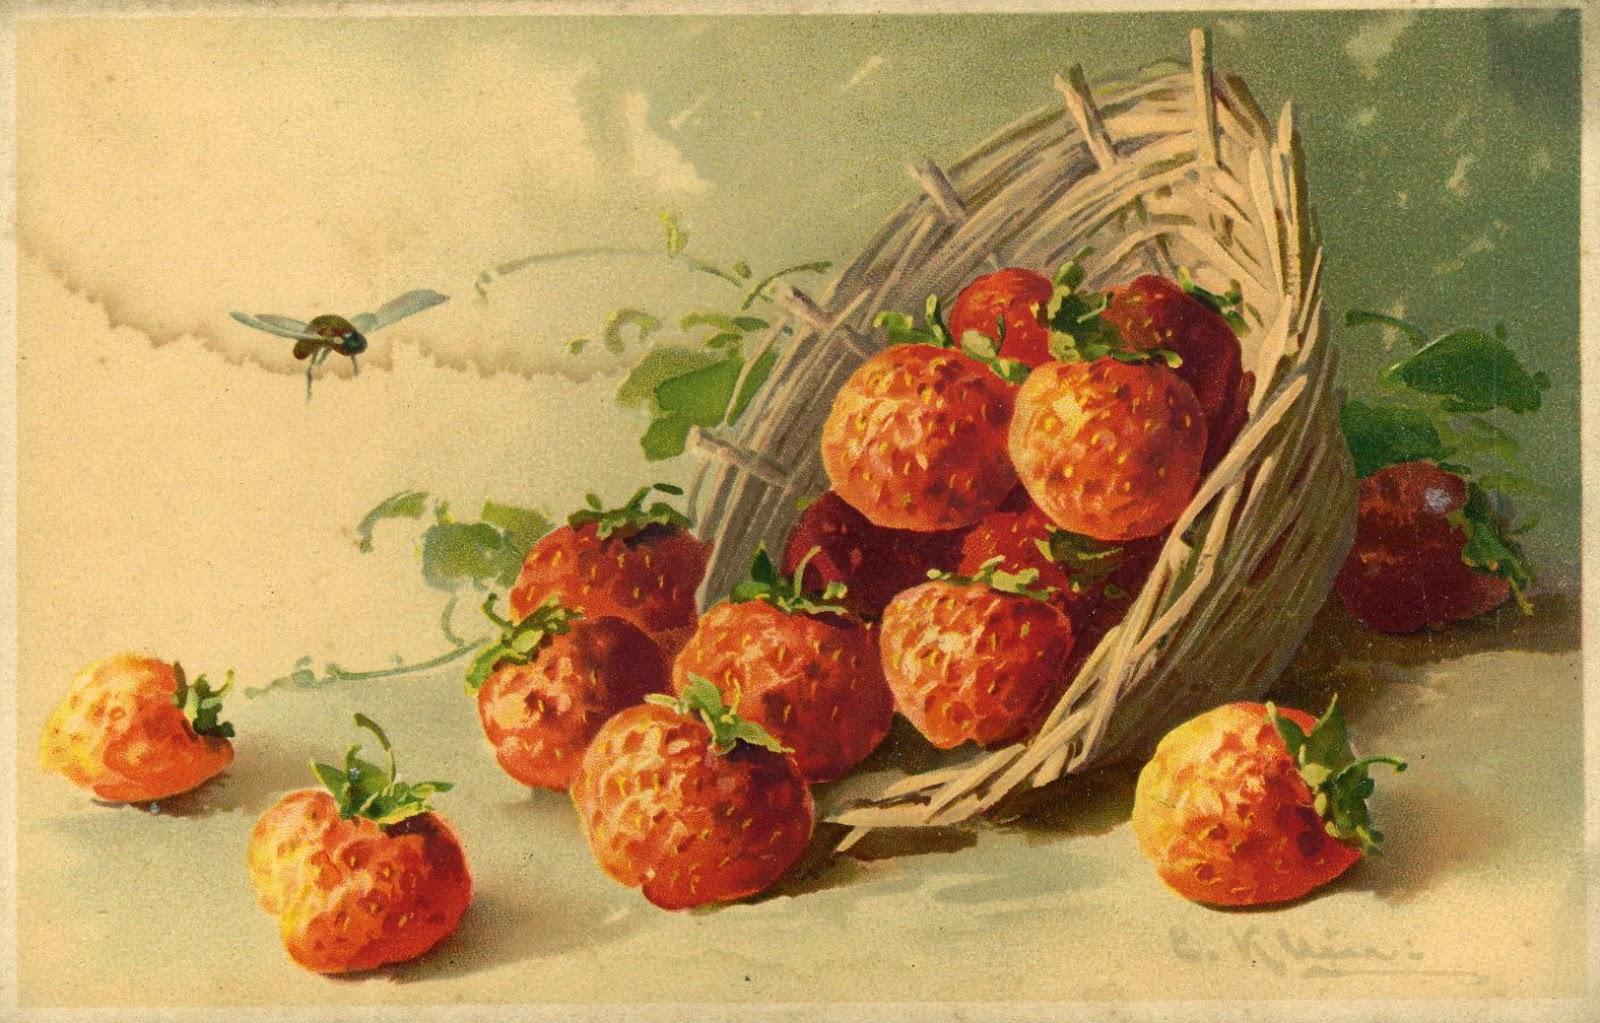 http://3.bp.blogspot.com/-RrmTxXUzLsM/U57JYwBdgUI/AAAAAAAAKb8/wQ-DA5drlmg/s1600/lbb+klein+strawberries.jpg